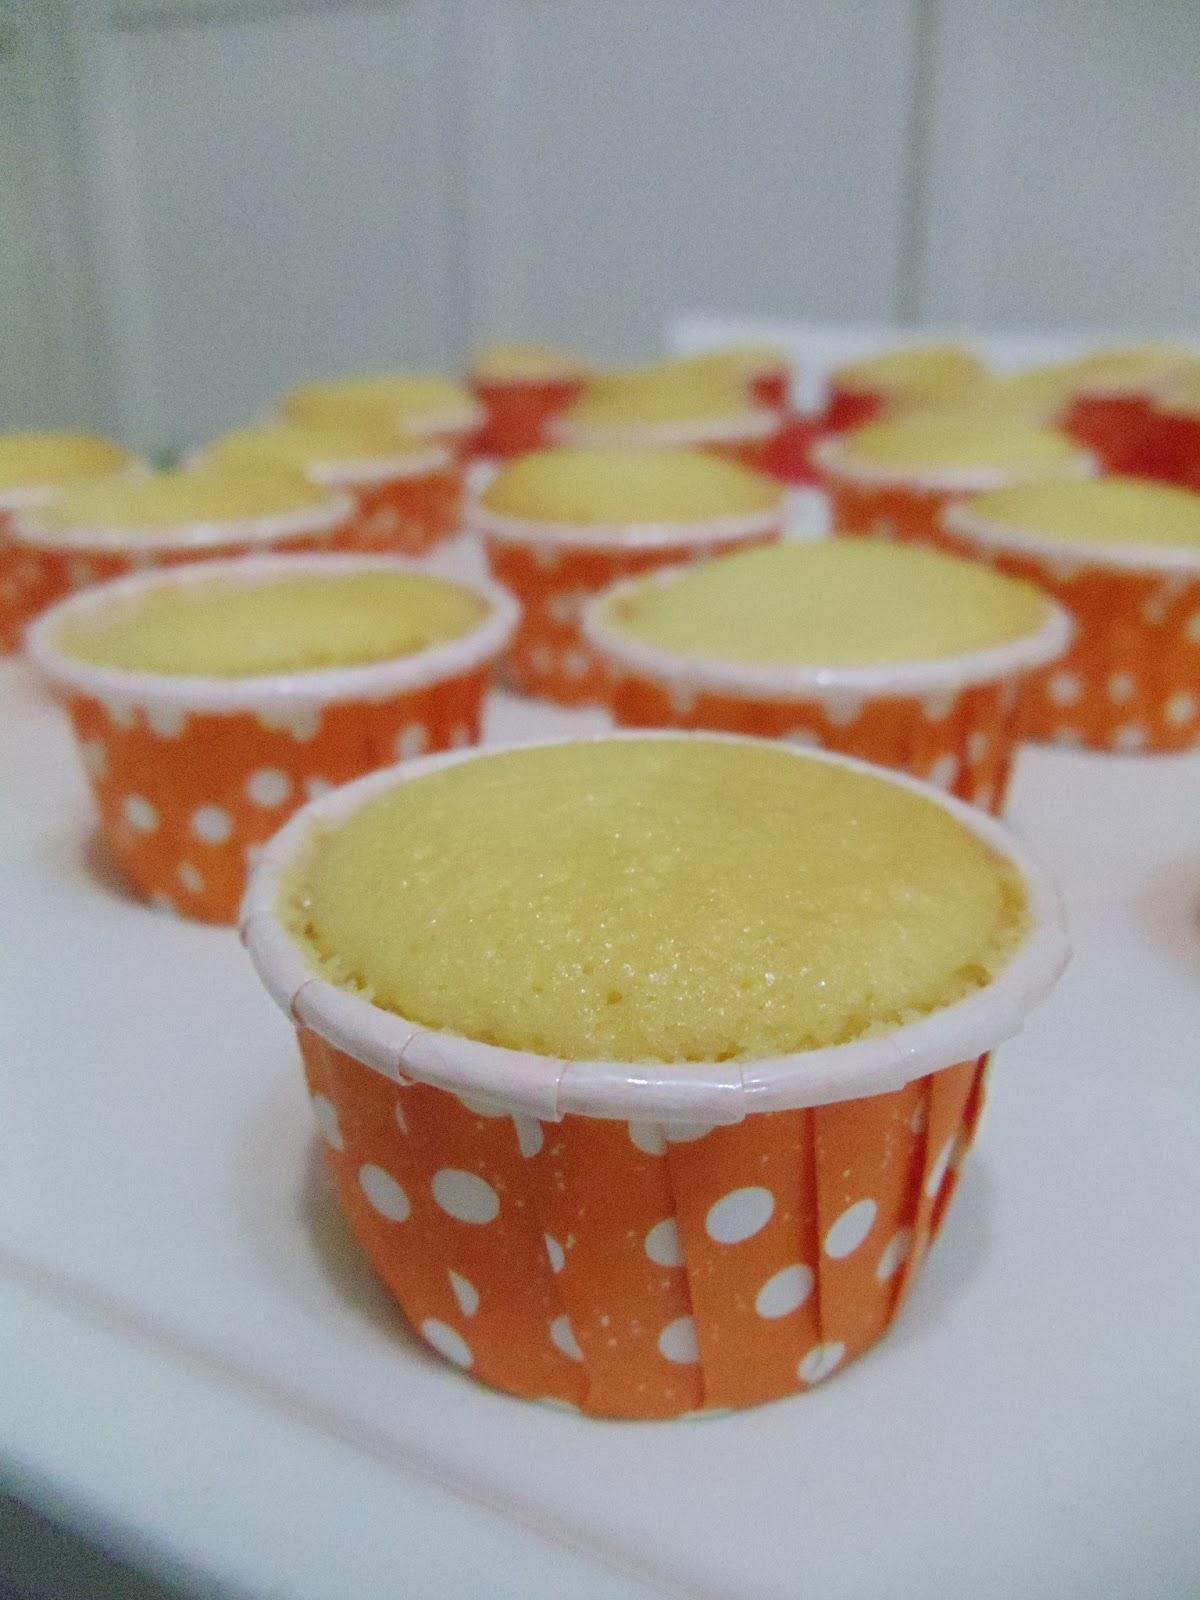 resepi cupcake mudah  sedap Resepi Kek Coklat Sukatan Cawan Enak dan Mudah